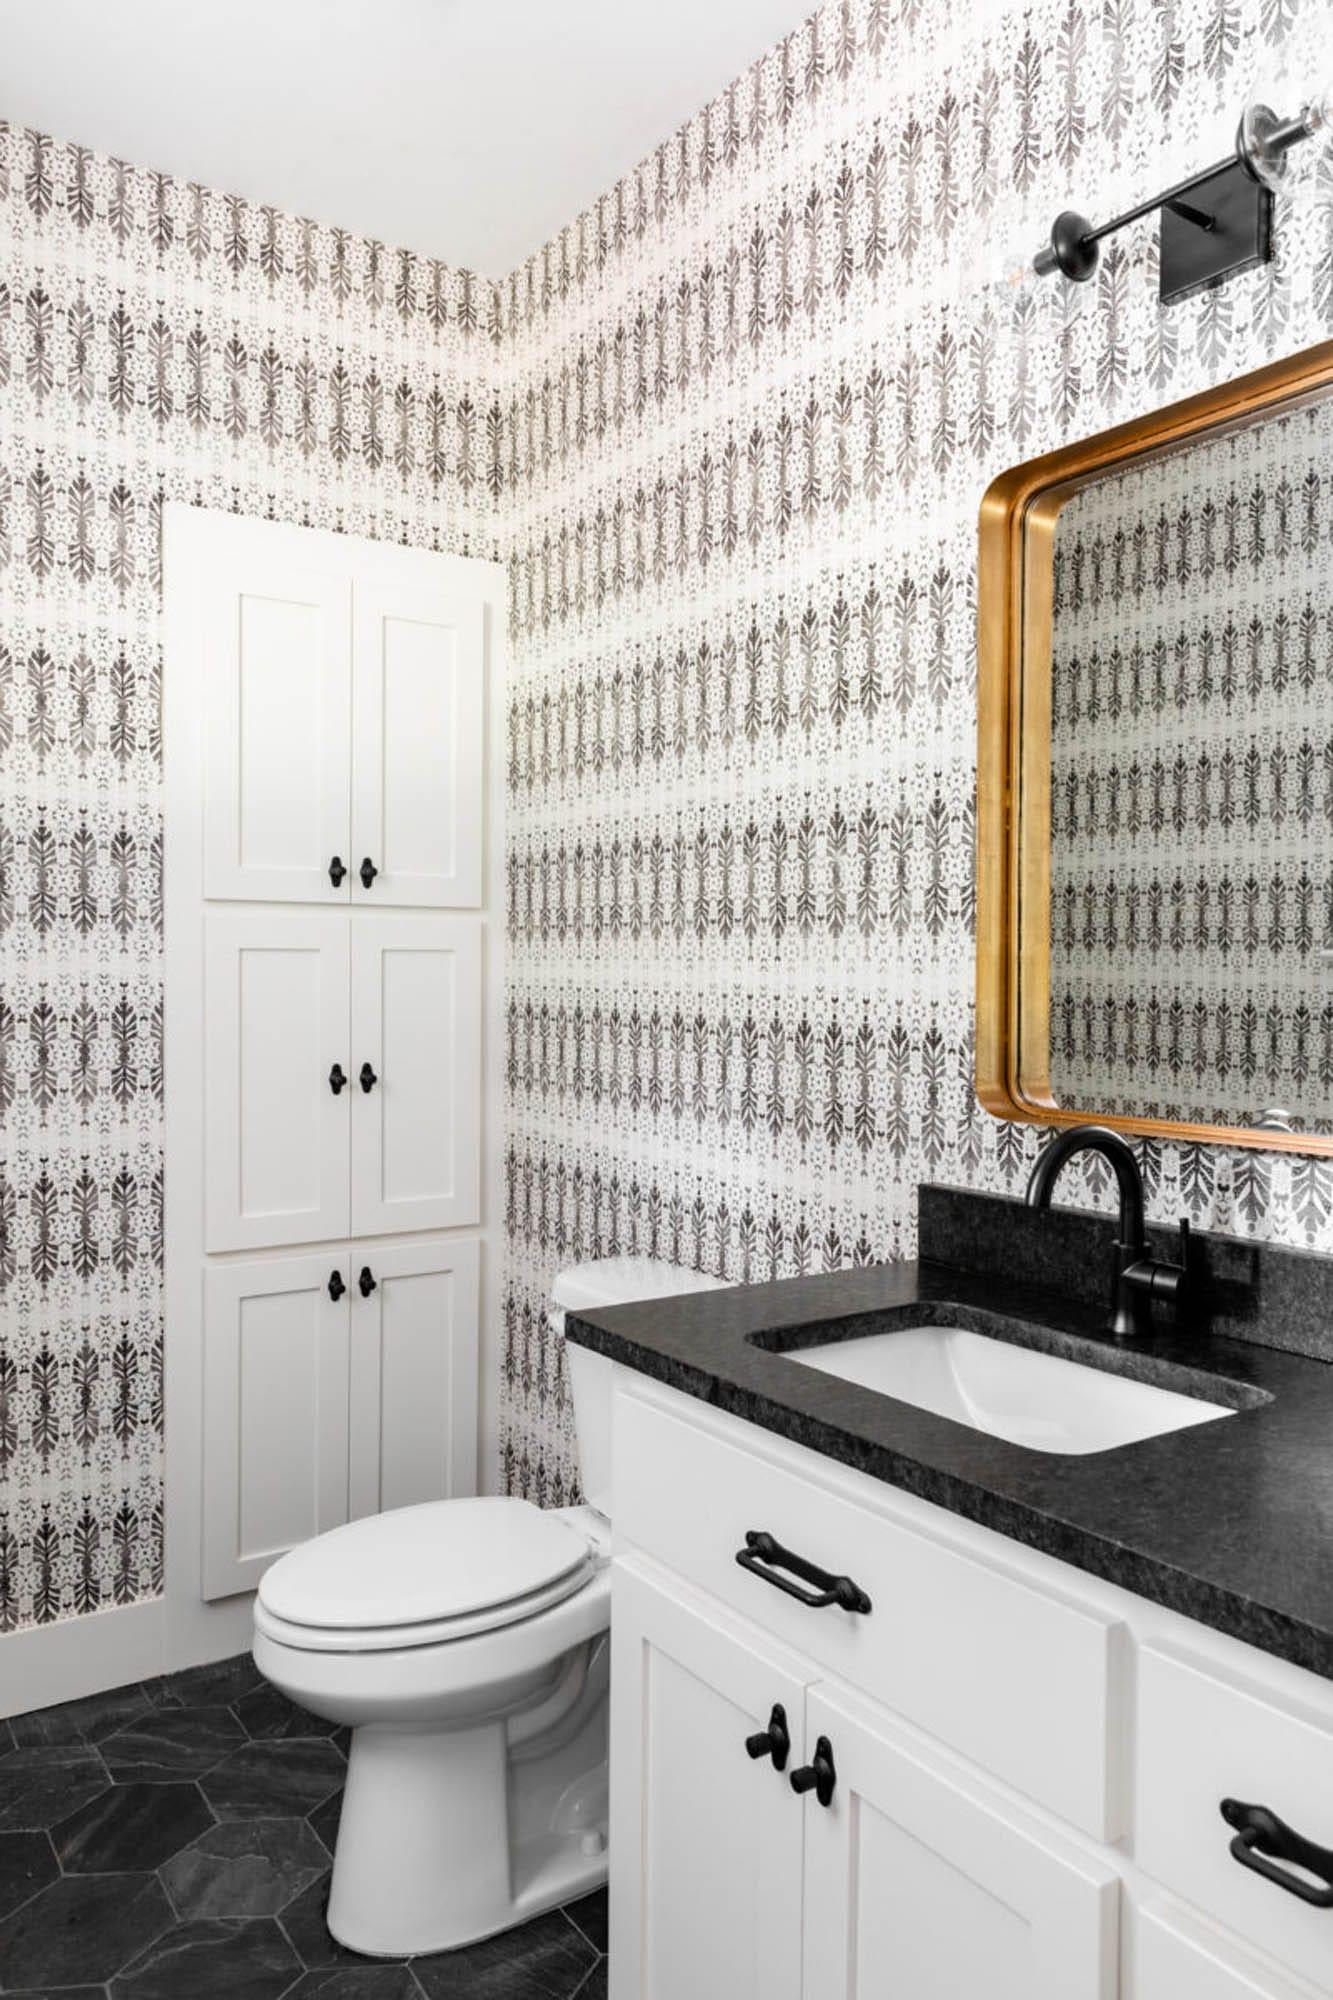 Glamorous bathroom with wallpaper